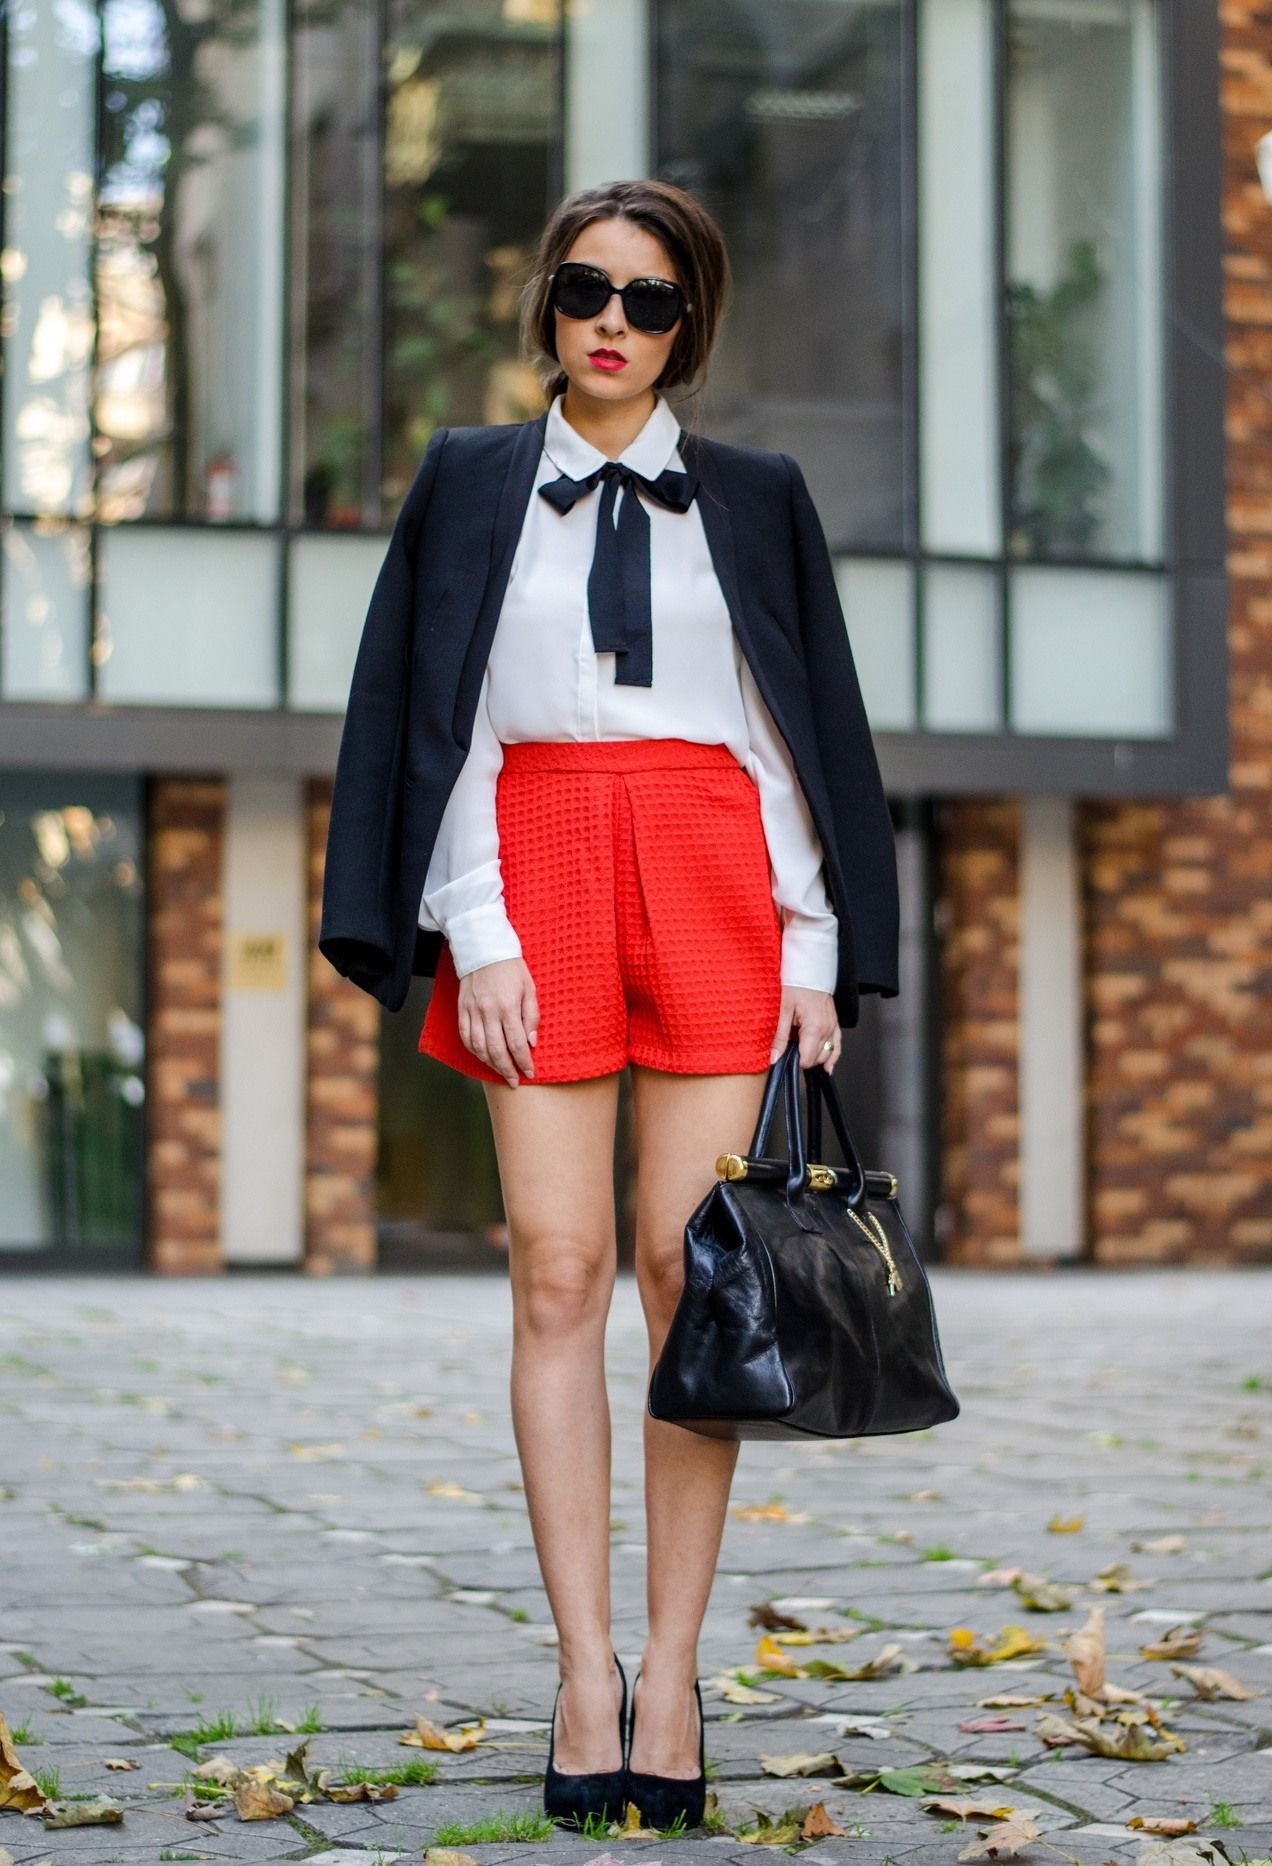 How To Dress As Preppy Girl 20 Cute Preppy Outfits Ideas